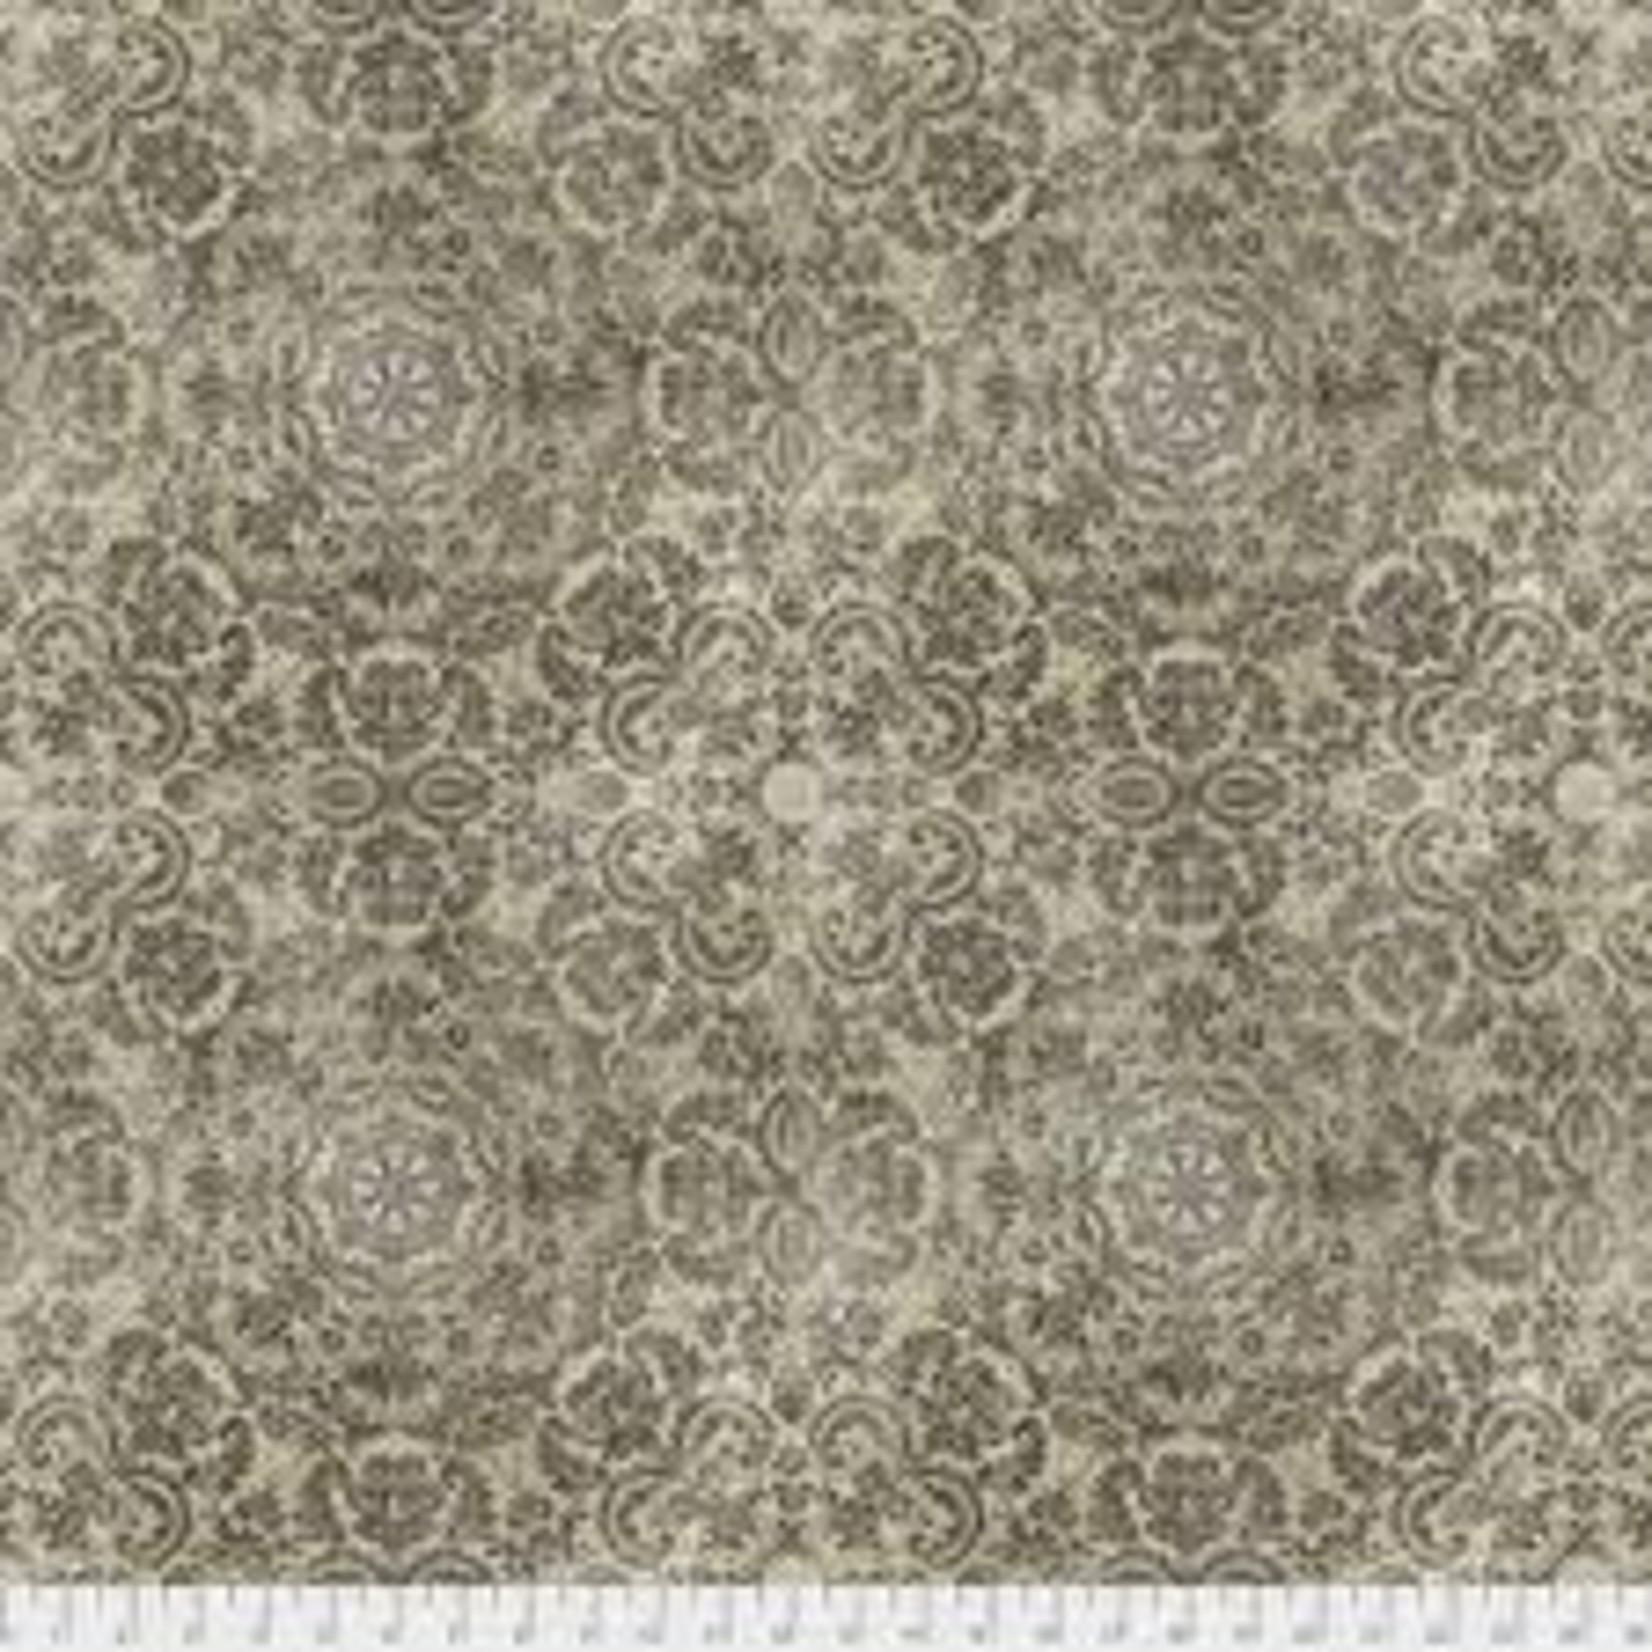 FreeSpirit Fabrics Materialize - Gothic in Neutral